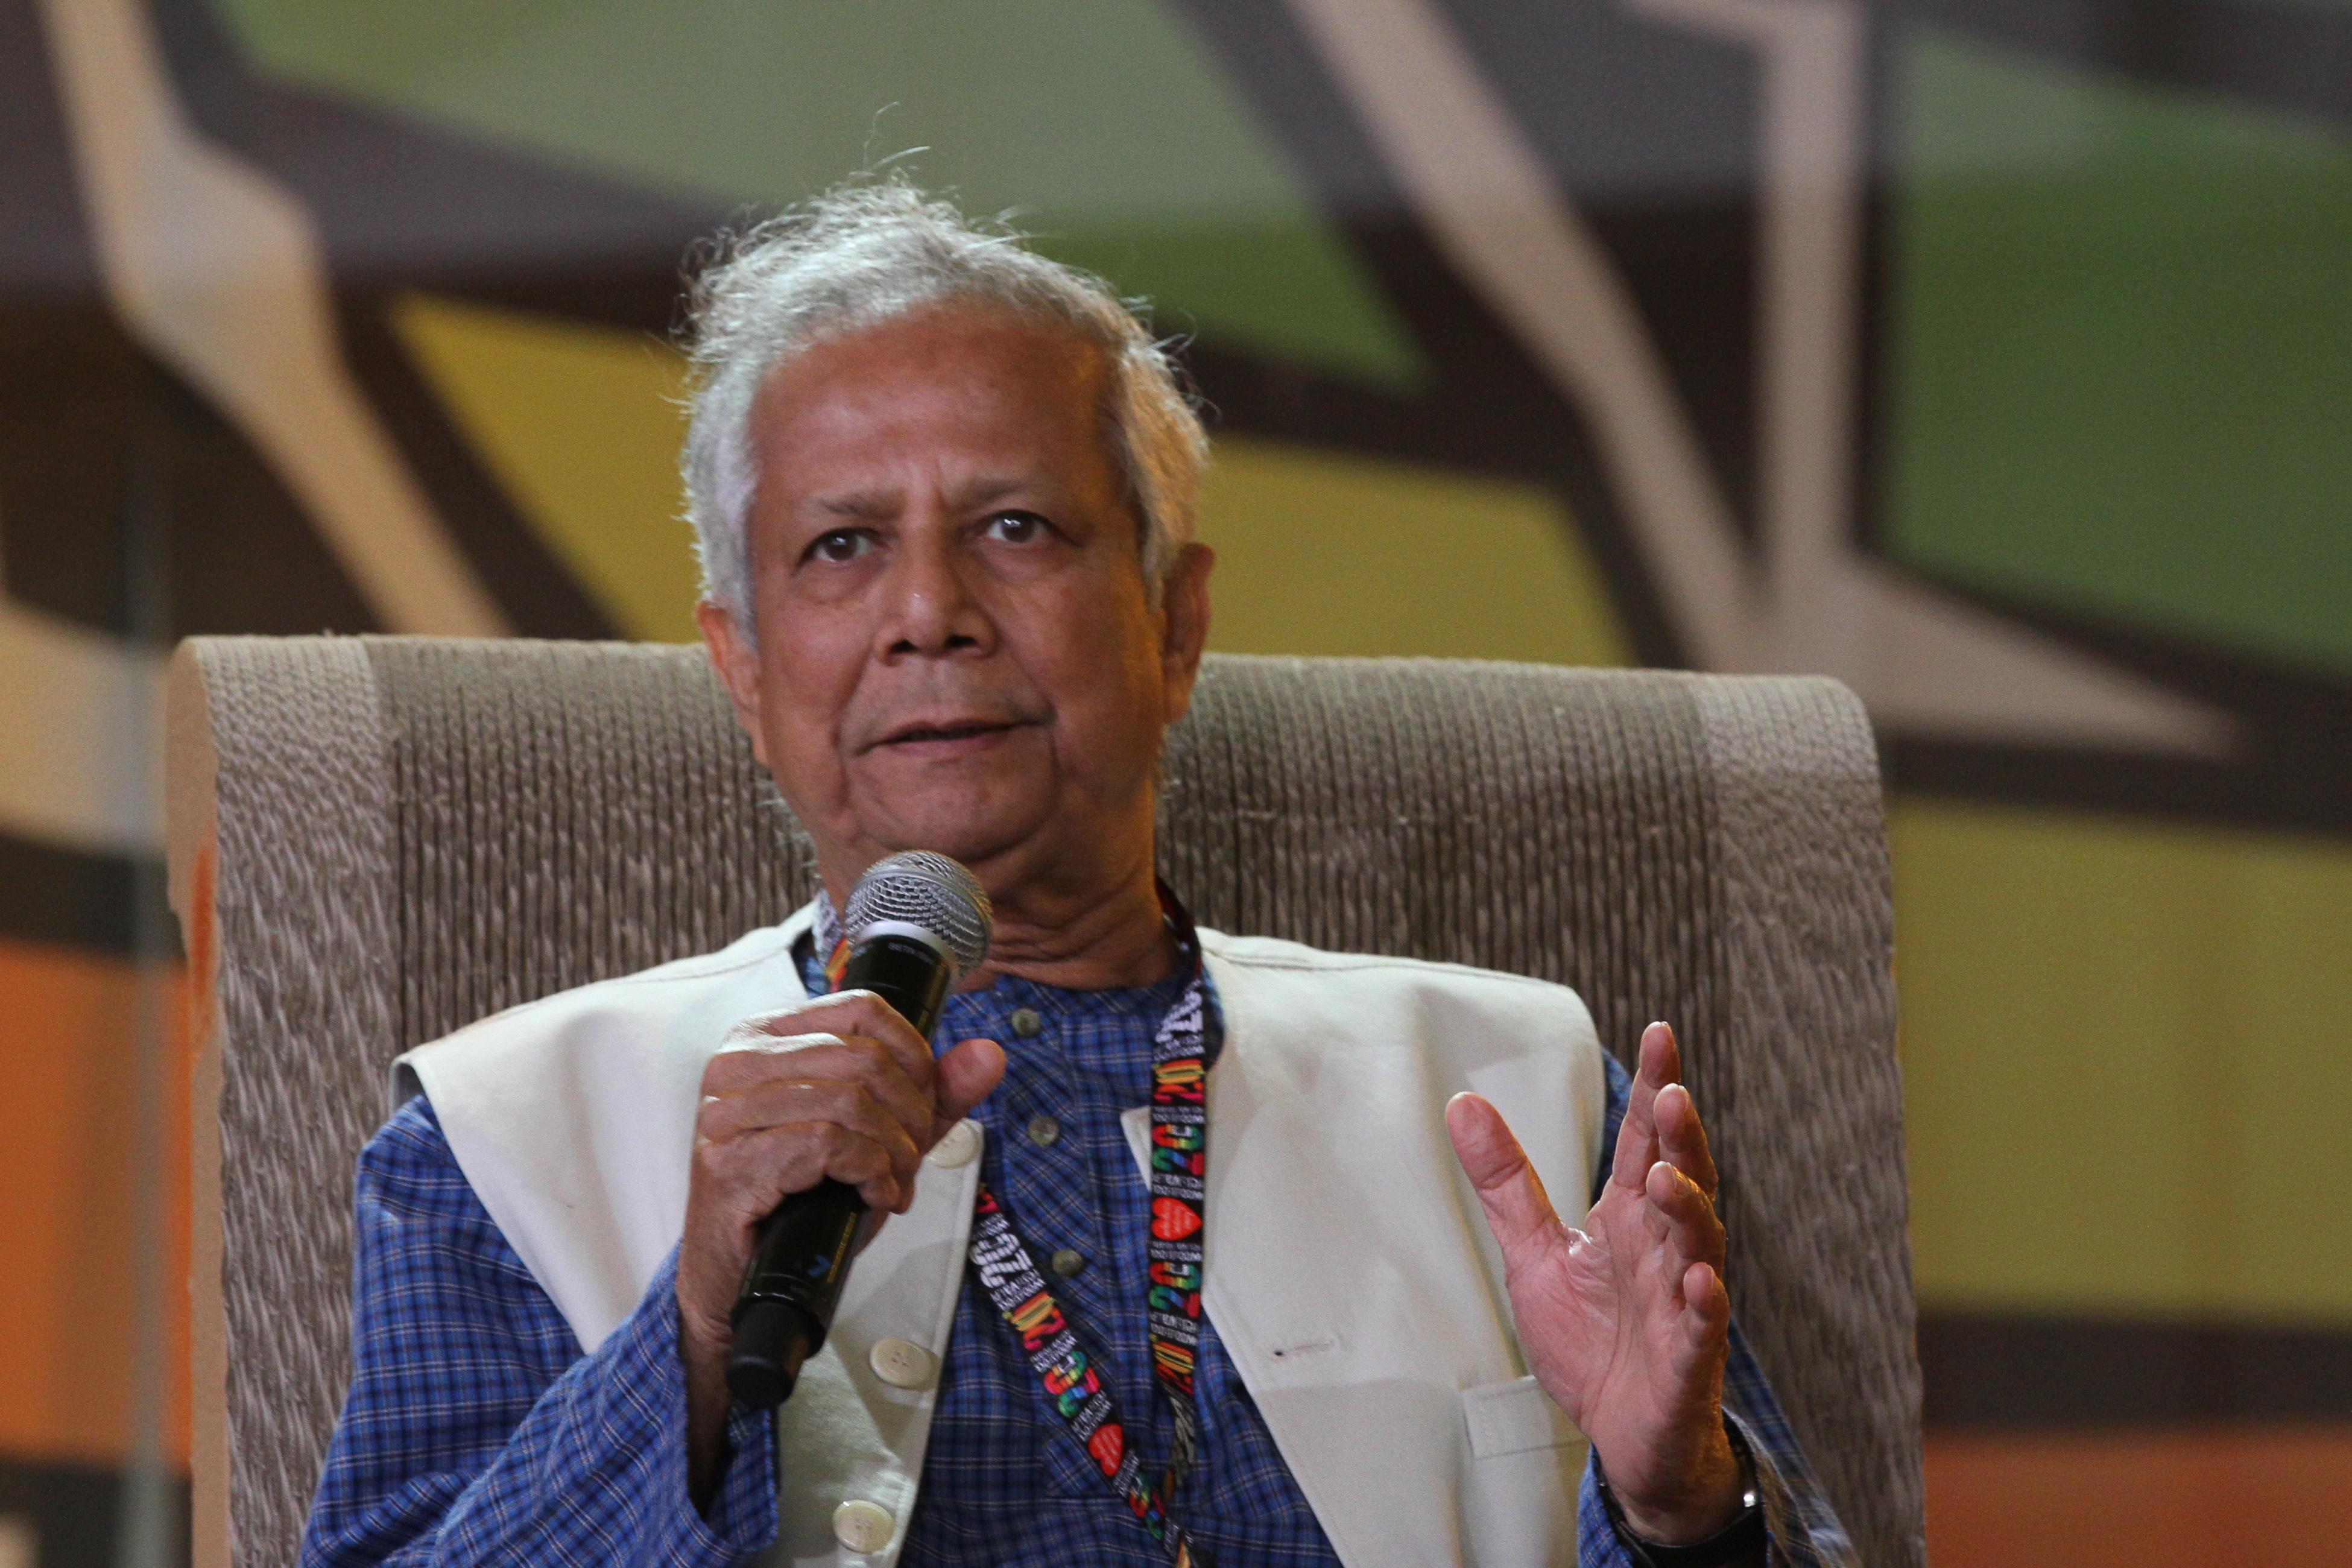 Depiction of Muhammad Yunus